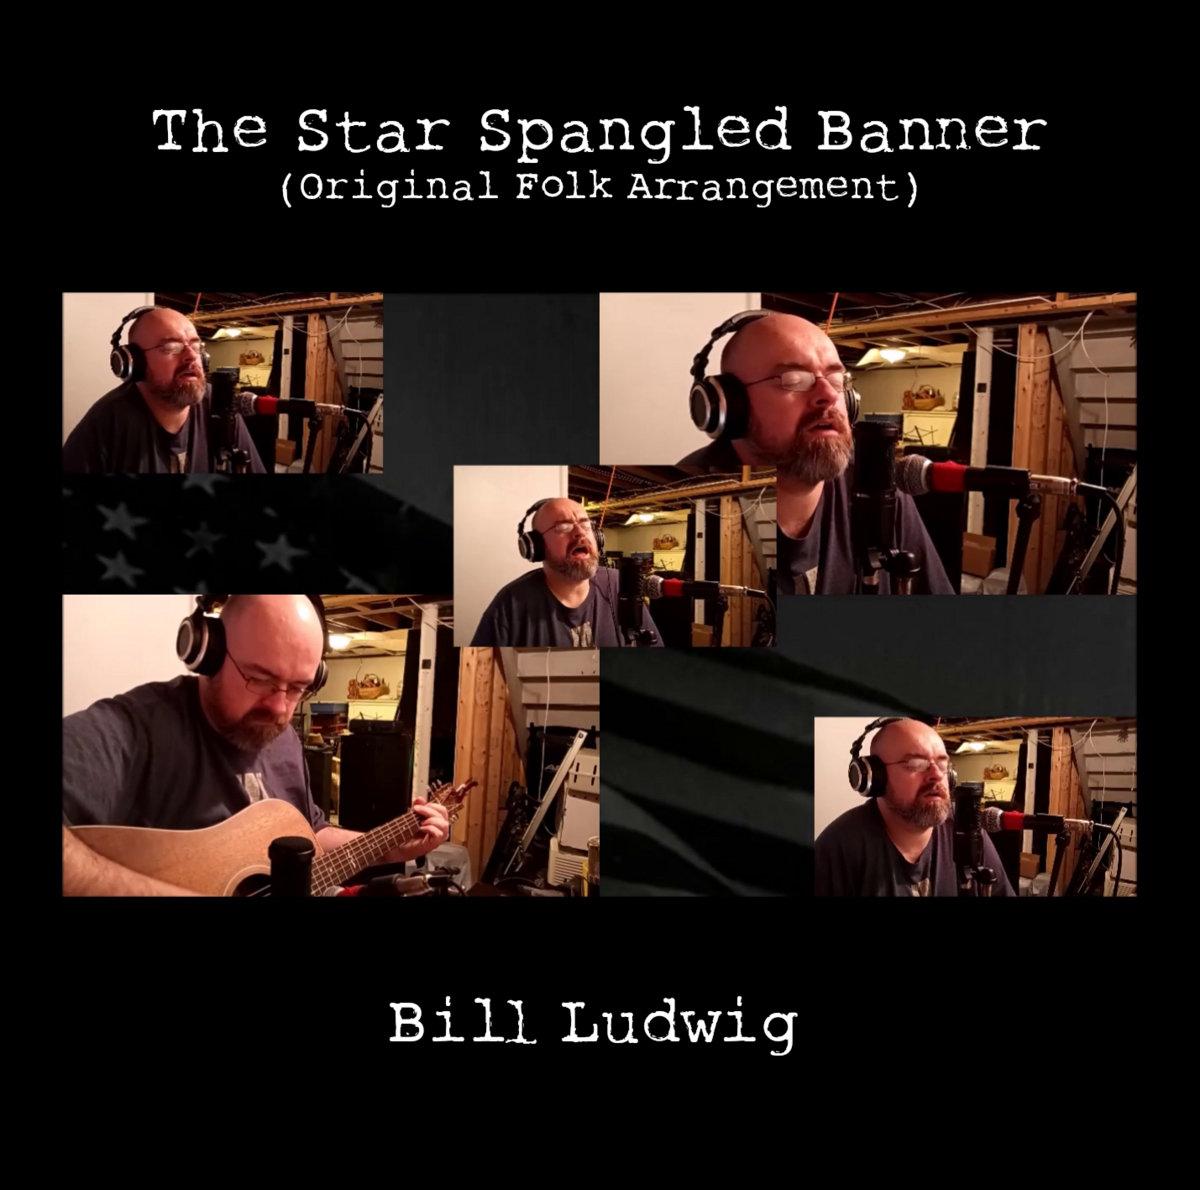 The Star Spangled Banner (Original Folk Arrangement) by Bill Ludwig